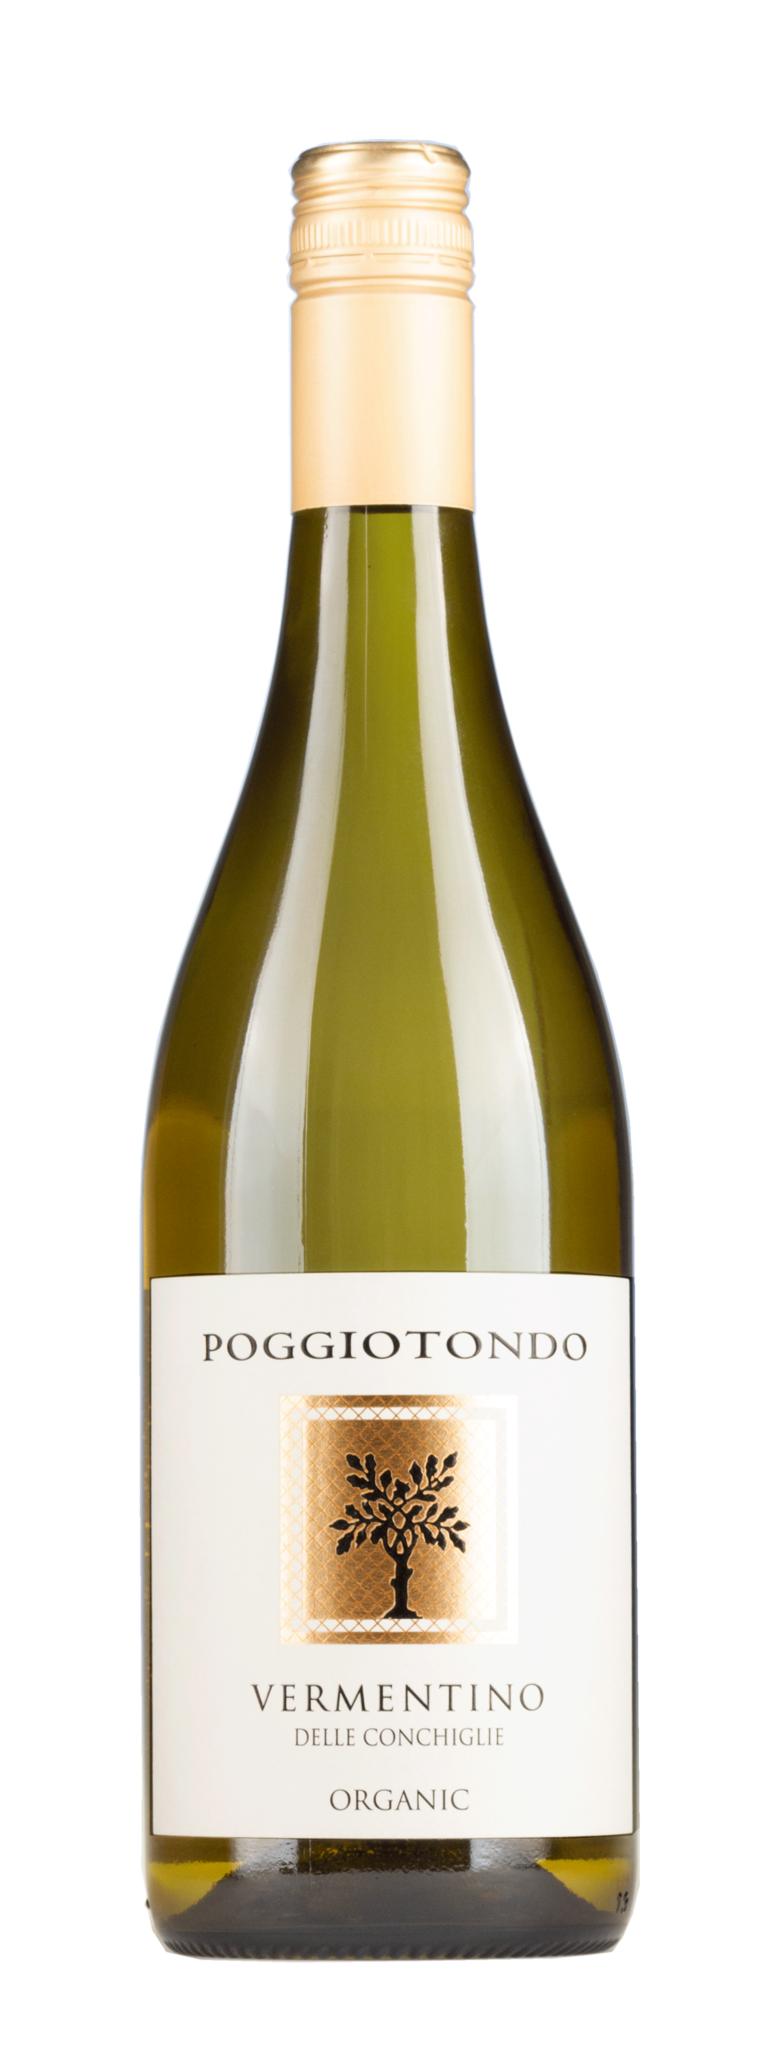 Poggiotondo, Toskana 2020 Vermentino,  Toskana Bianco IGT, Poggiotondo